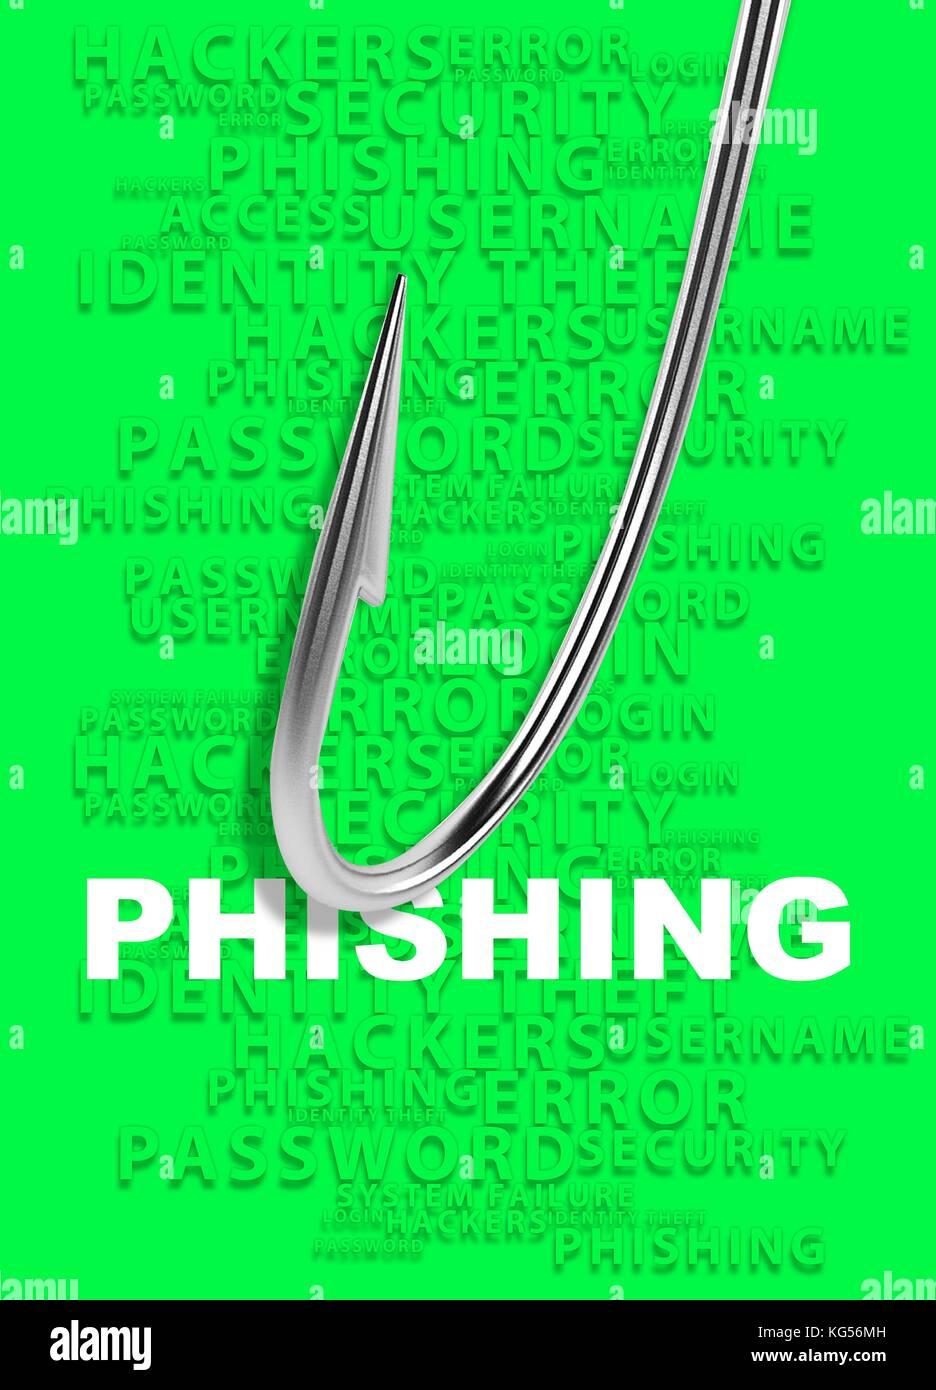 Phishing concept, illustration. - Stock Image